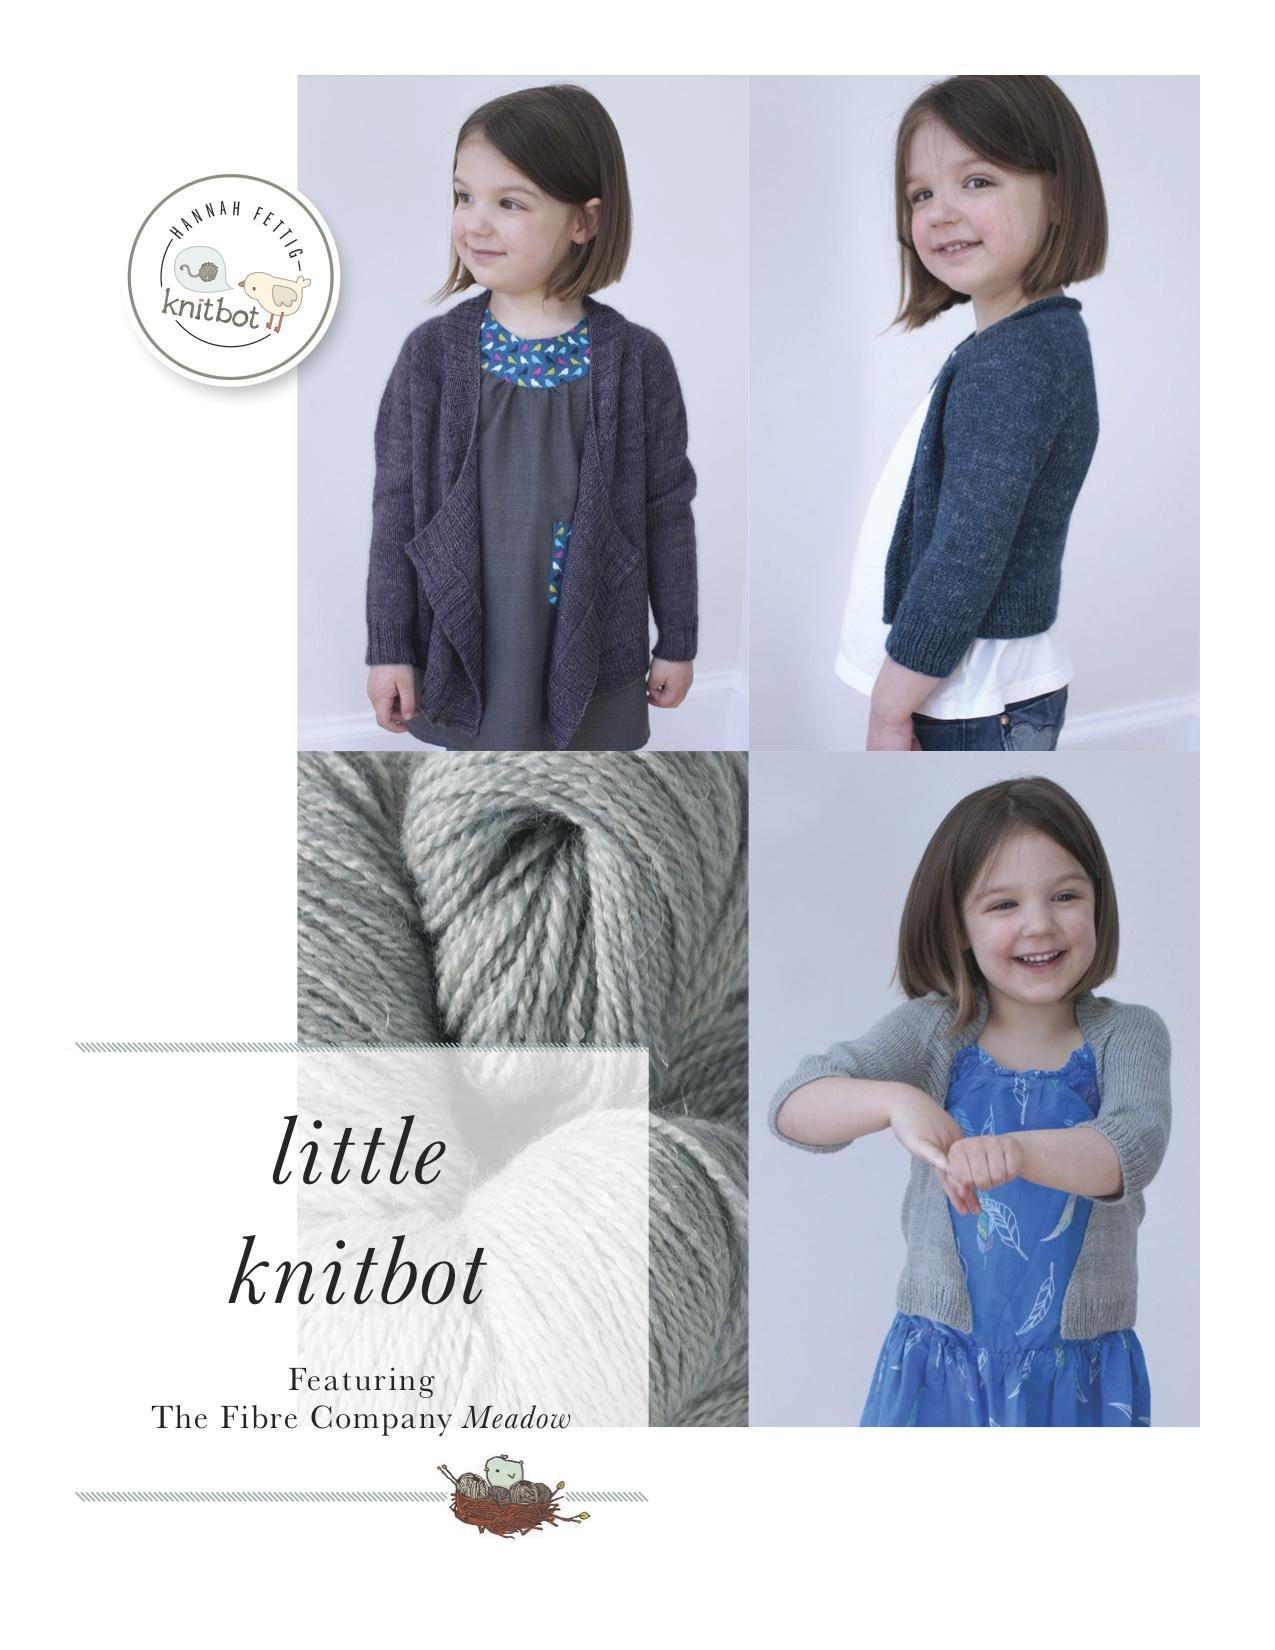 littleknitbot_cover.jpg